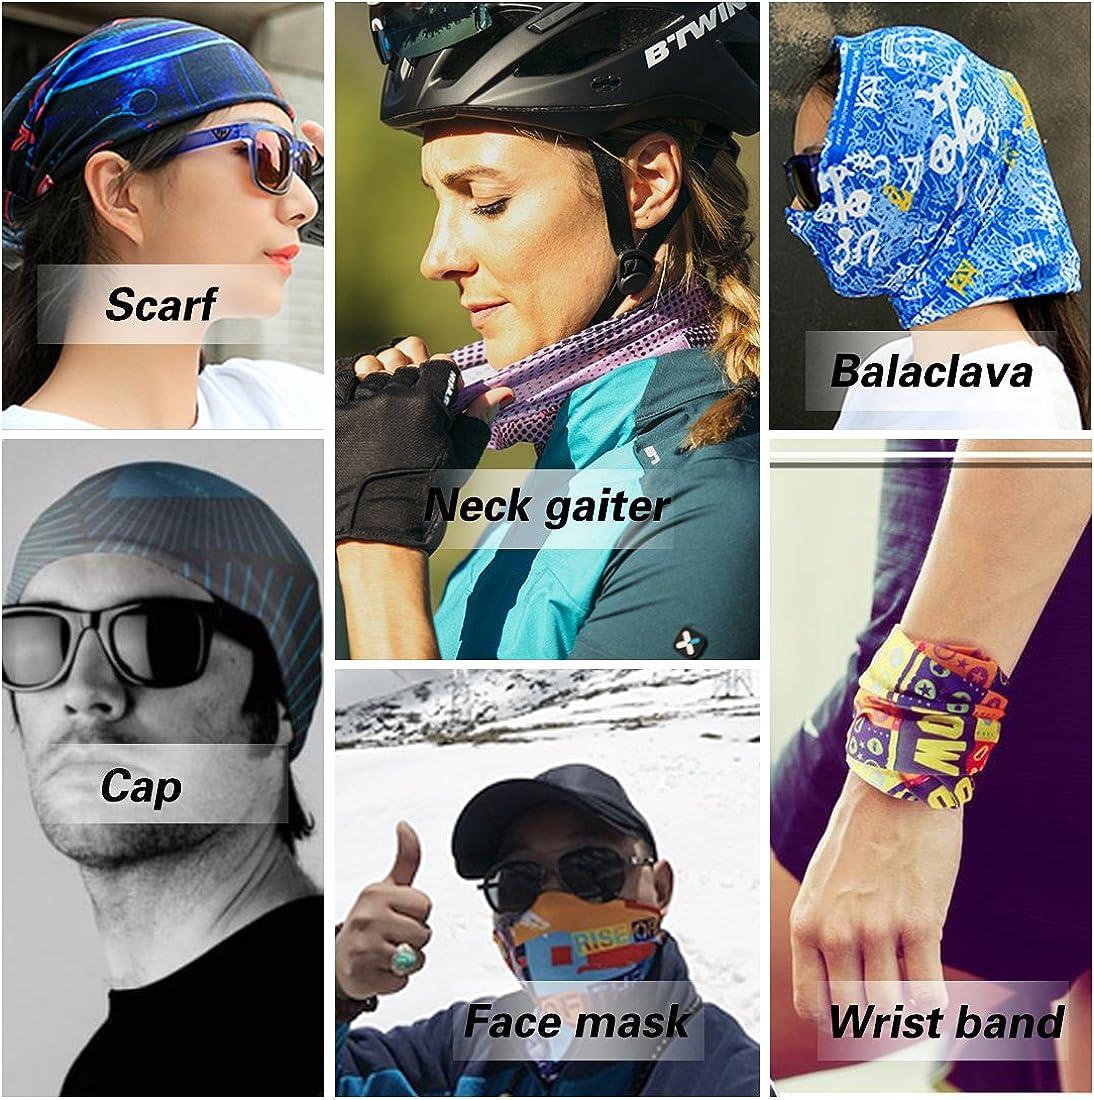 RAISEVERN Unisex Multifunktions Nahtlose Bandana 3D Cool Halstuch Multifunktionale Kopfbedeckung Bedrucktes Stirnband Schal Sport Headwrap Tube Bandanas f/ür Sport /& Outdoor Camping /& Wandern